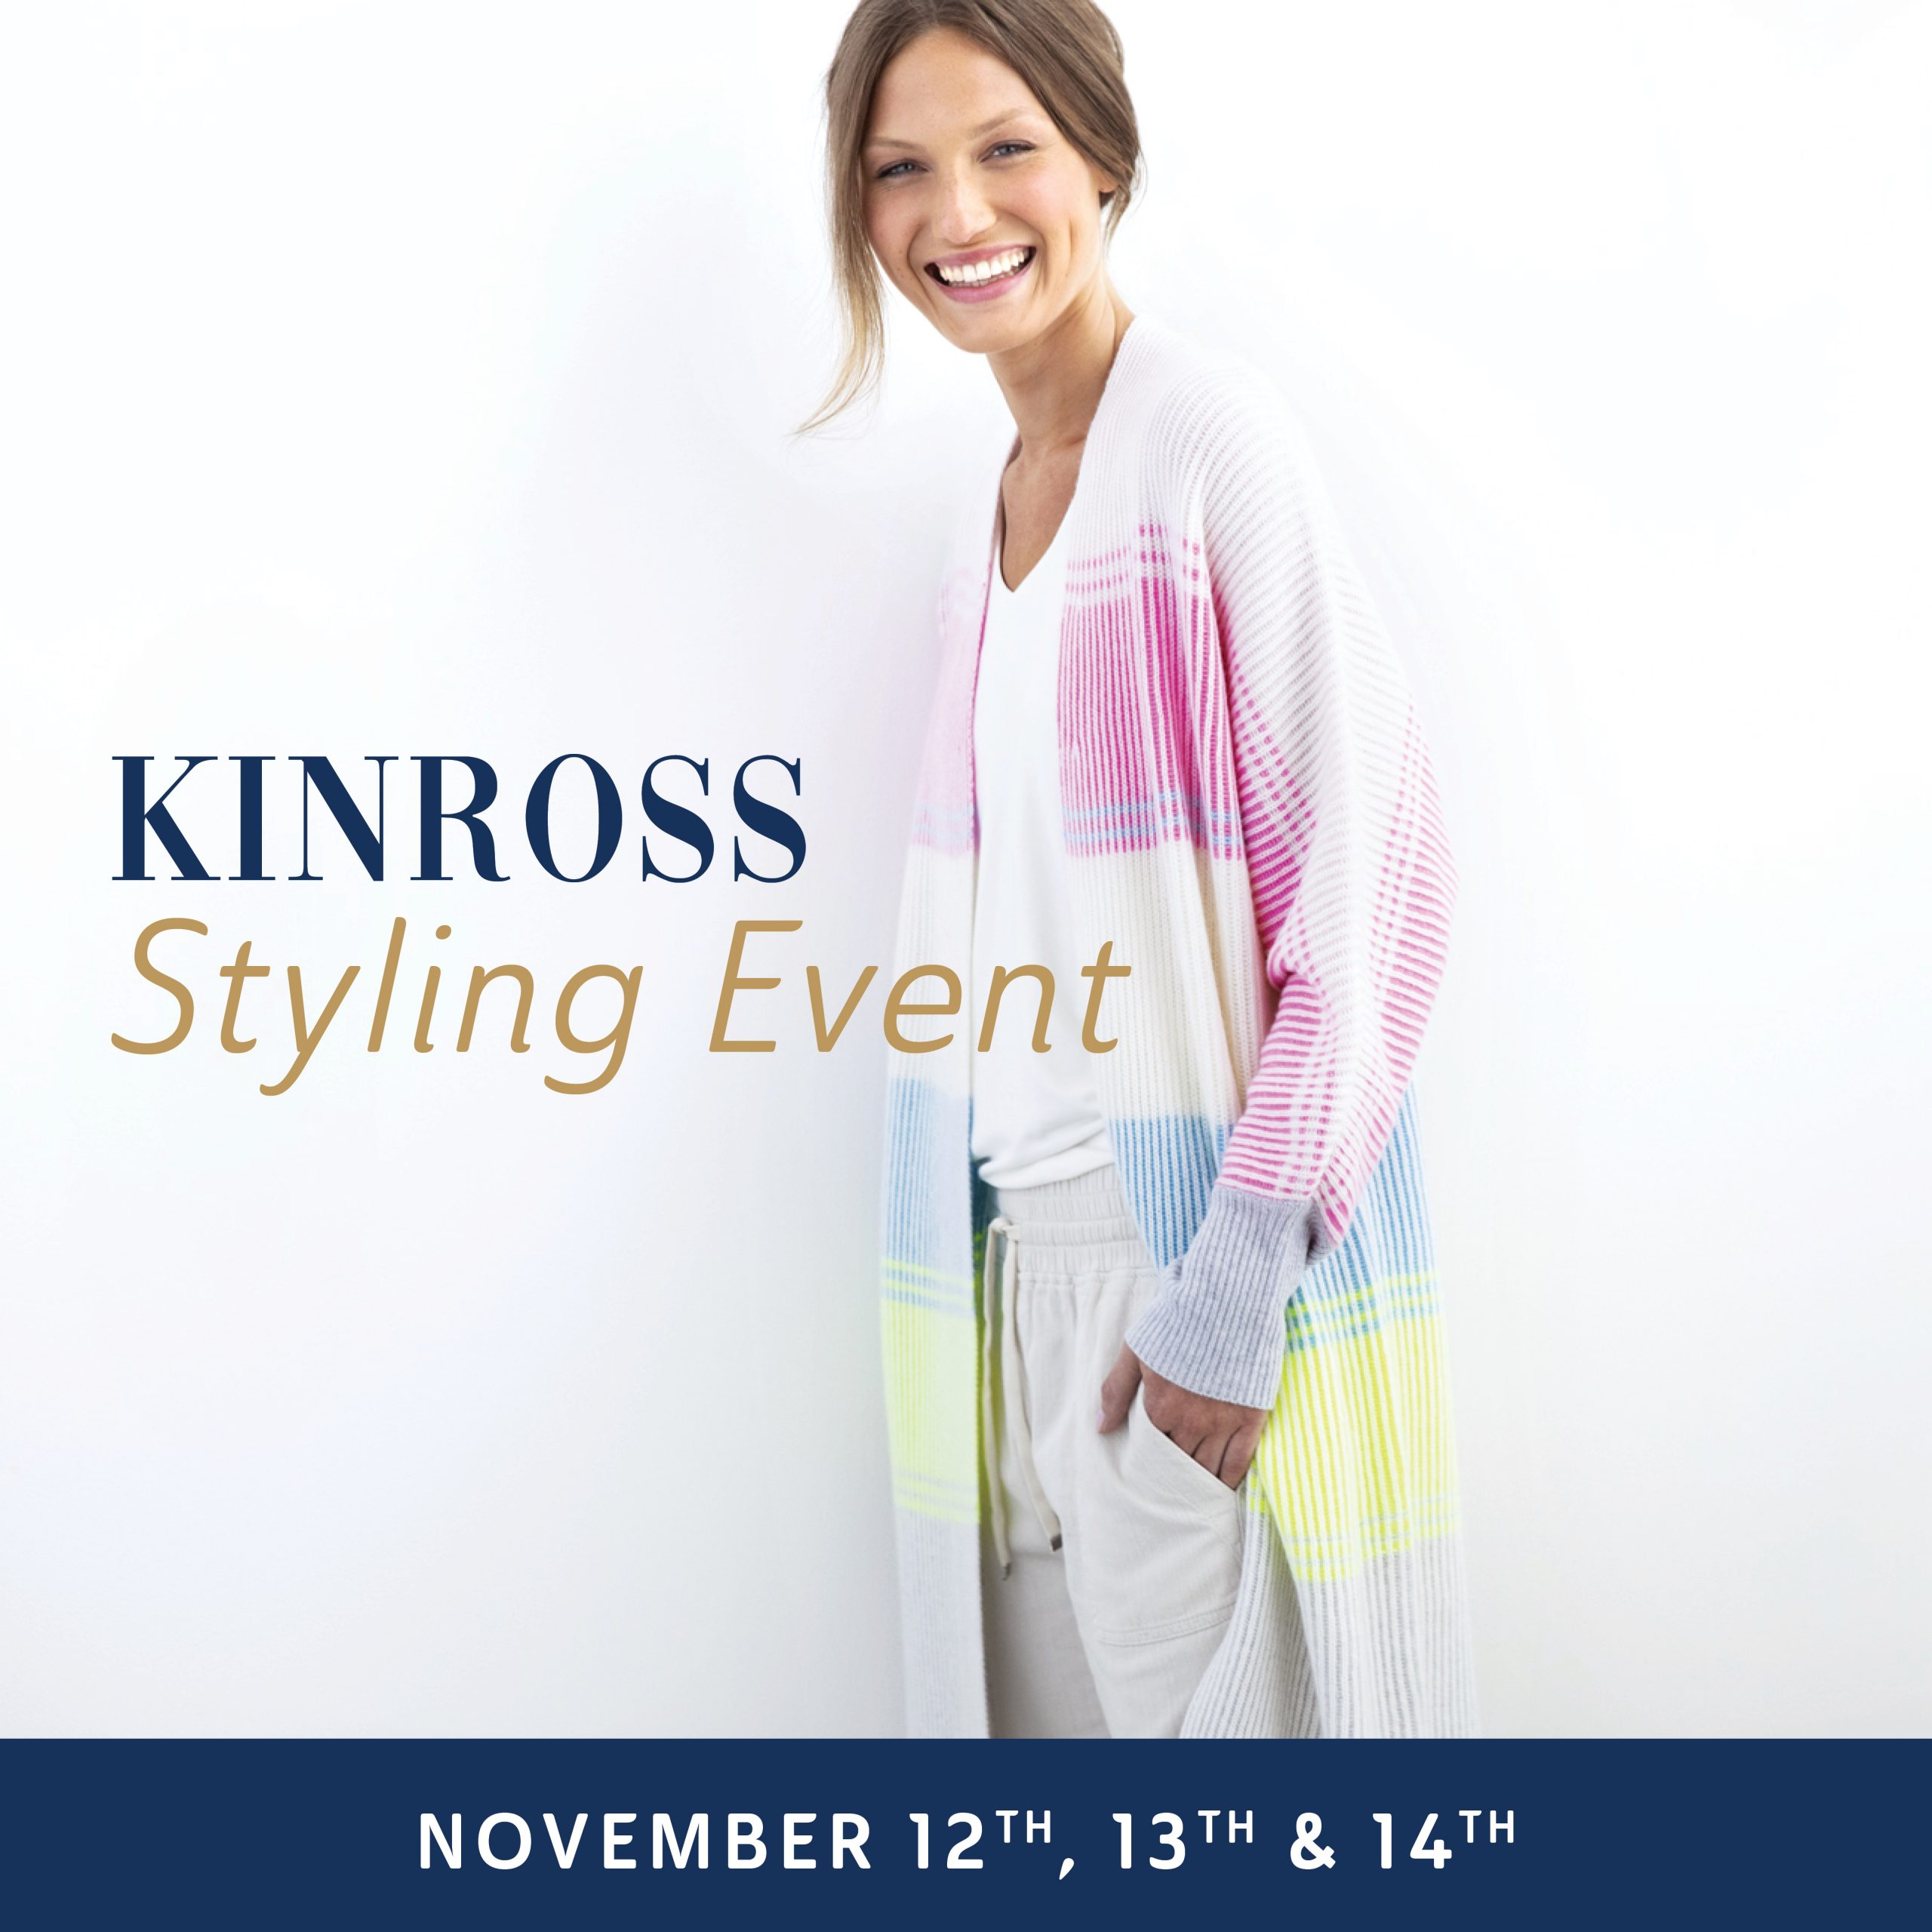 Kinross Styling Event